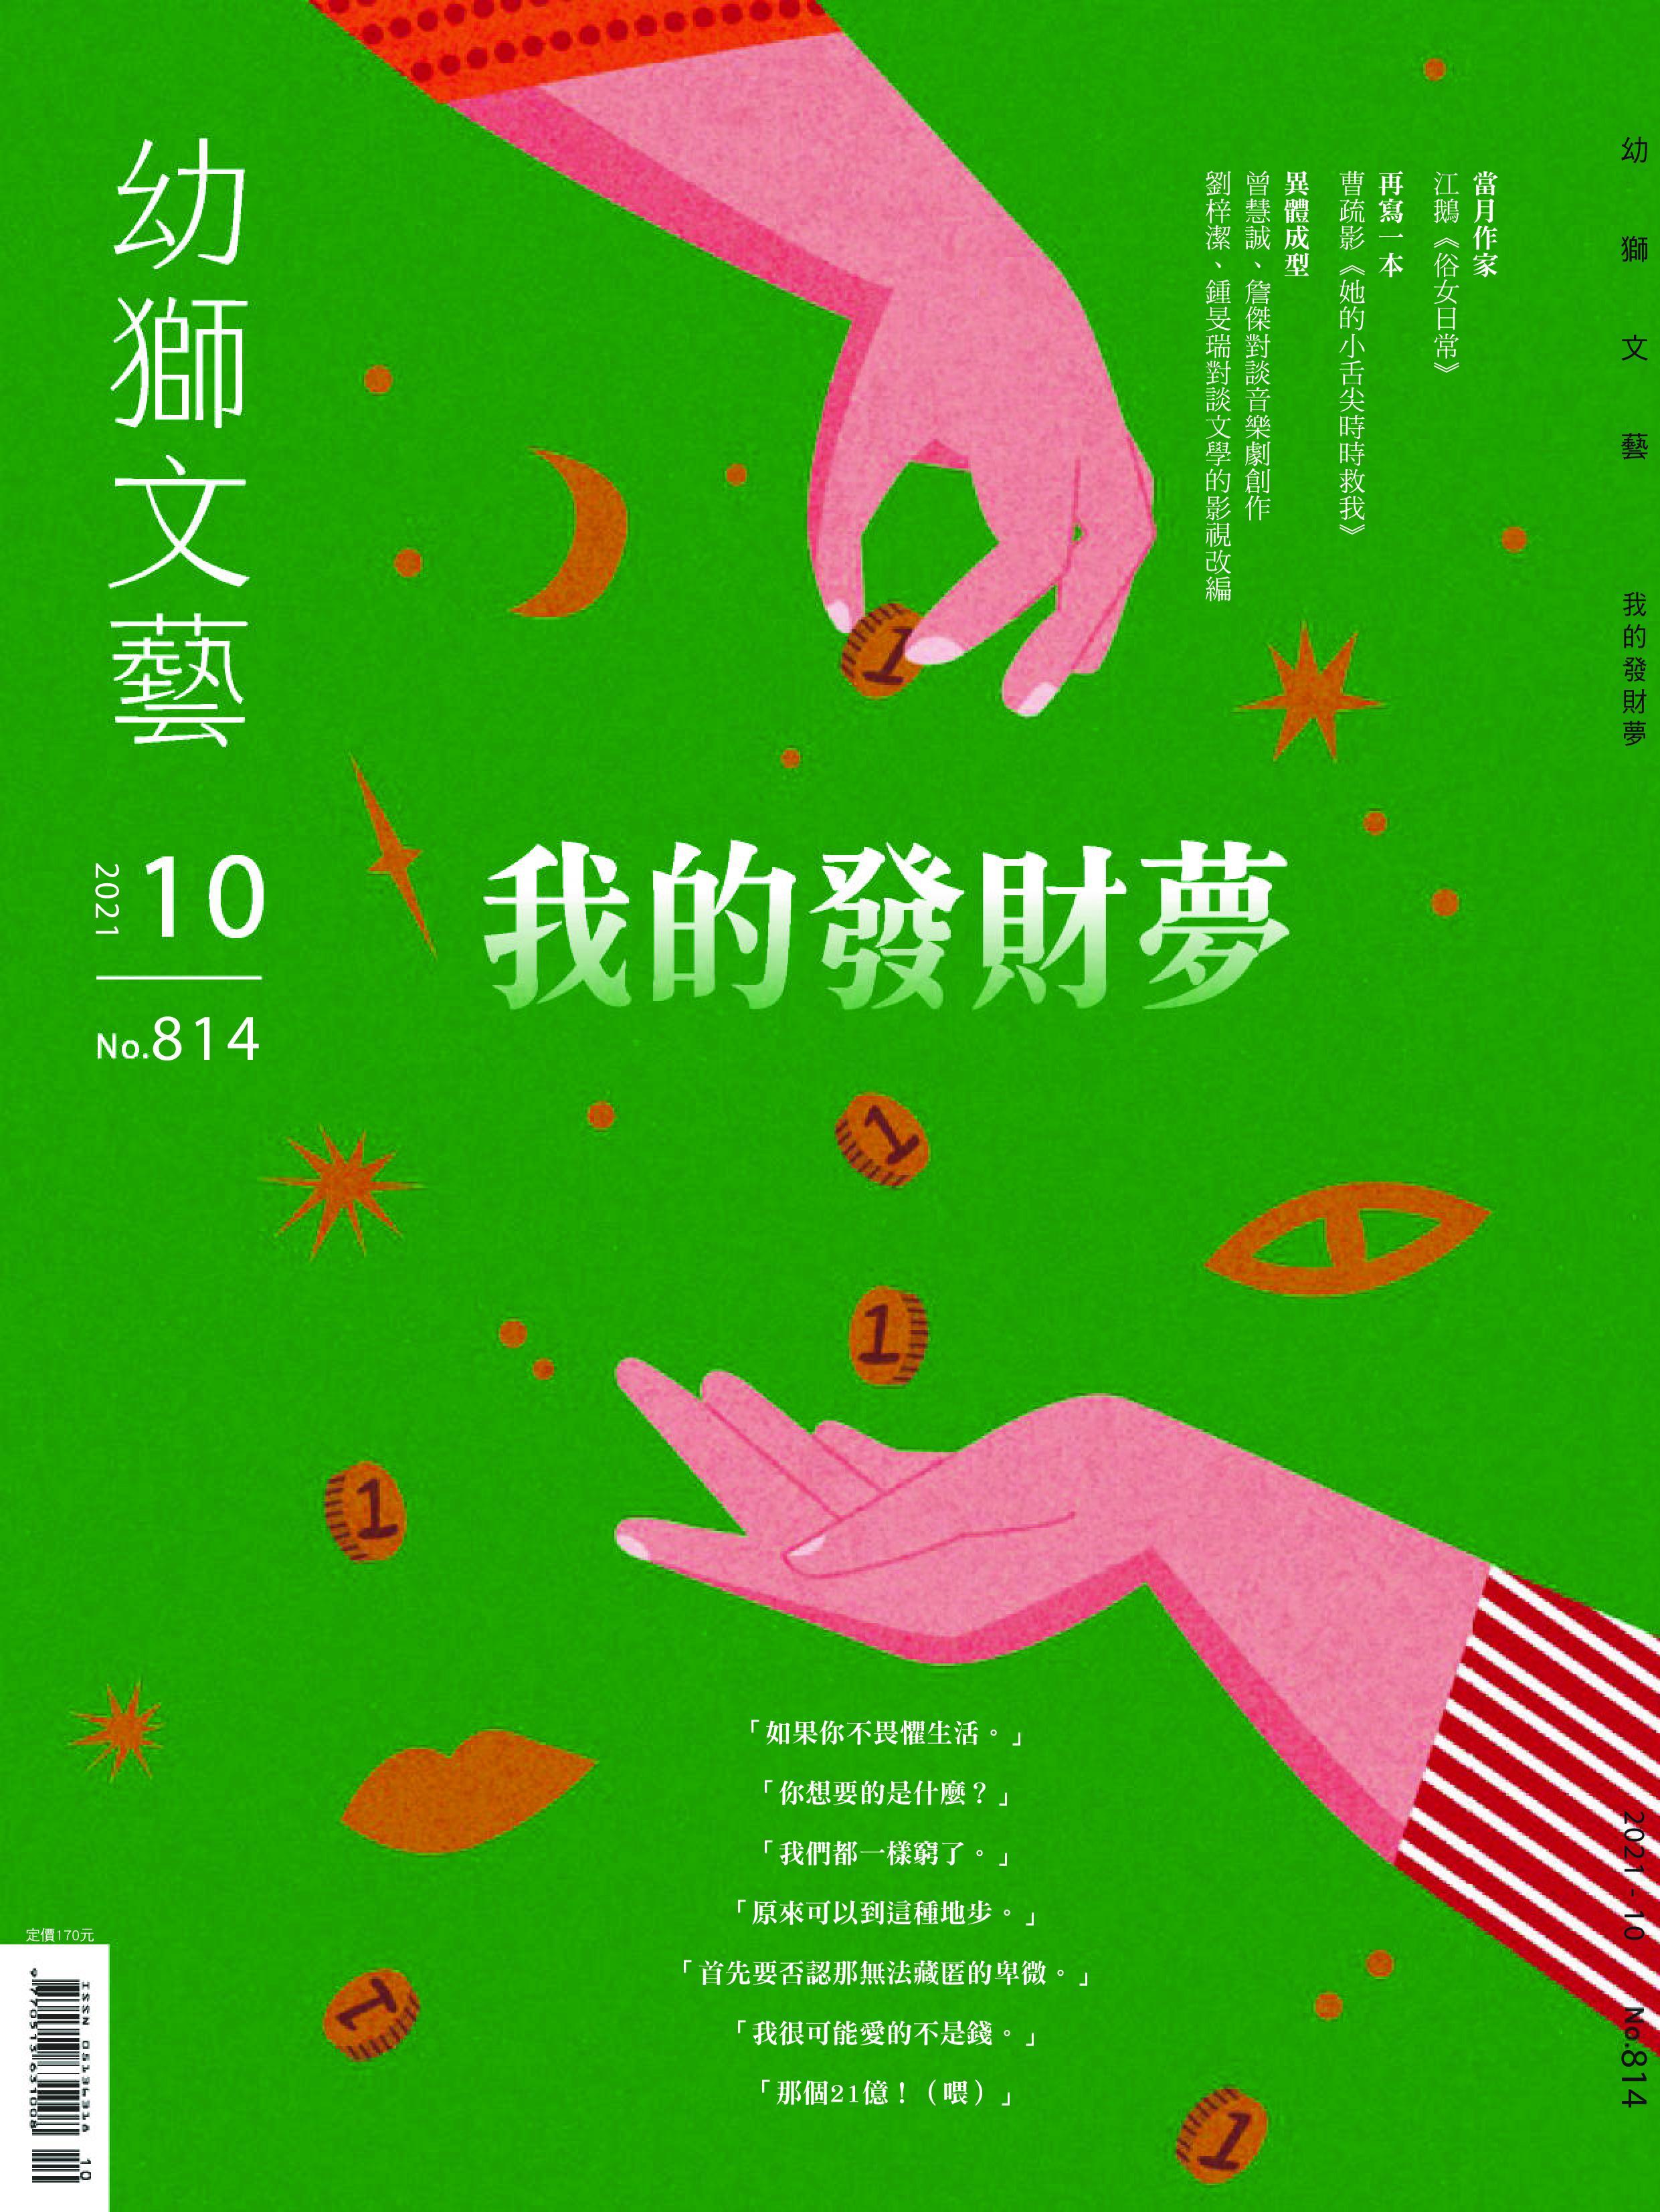 Youth literary Monthly 幼獅文藝 - 九月 2021